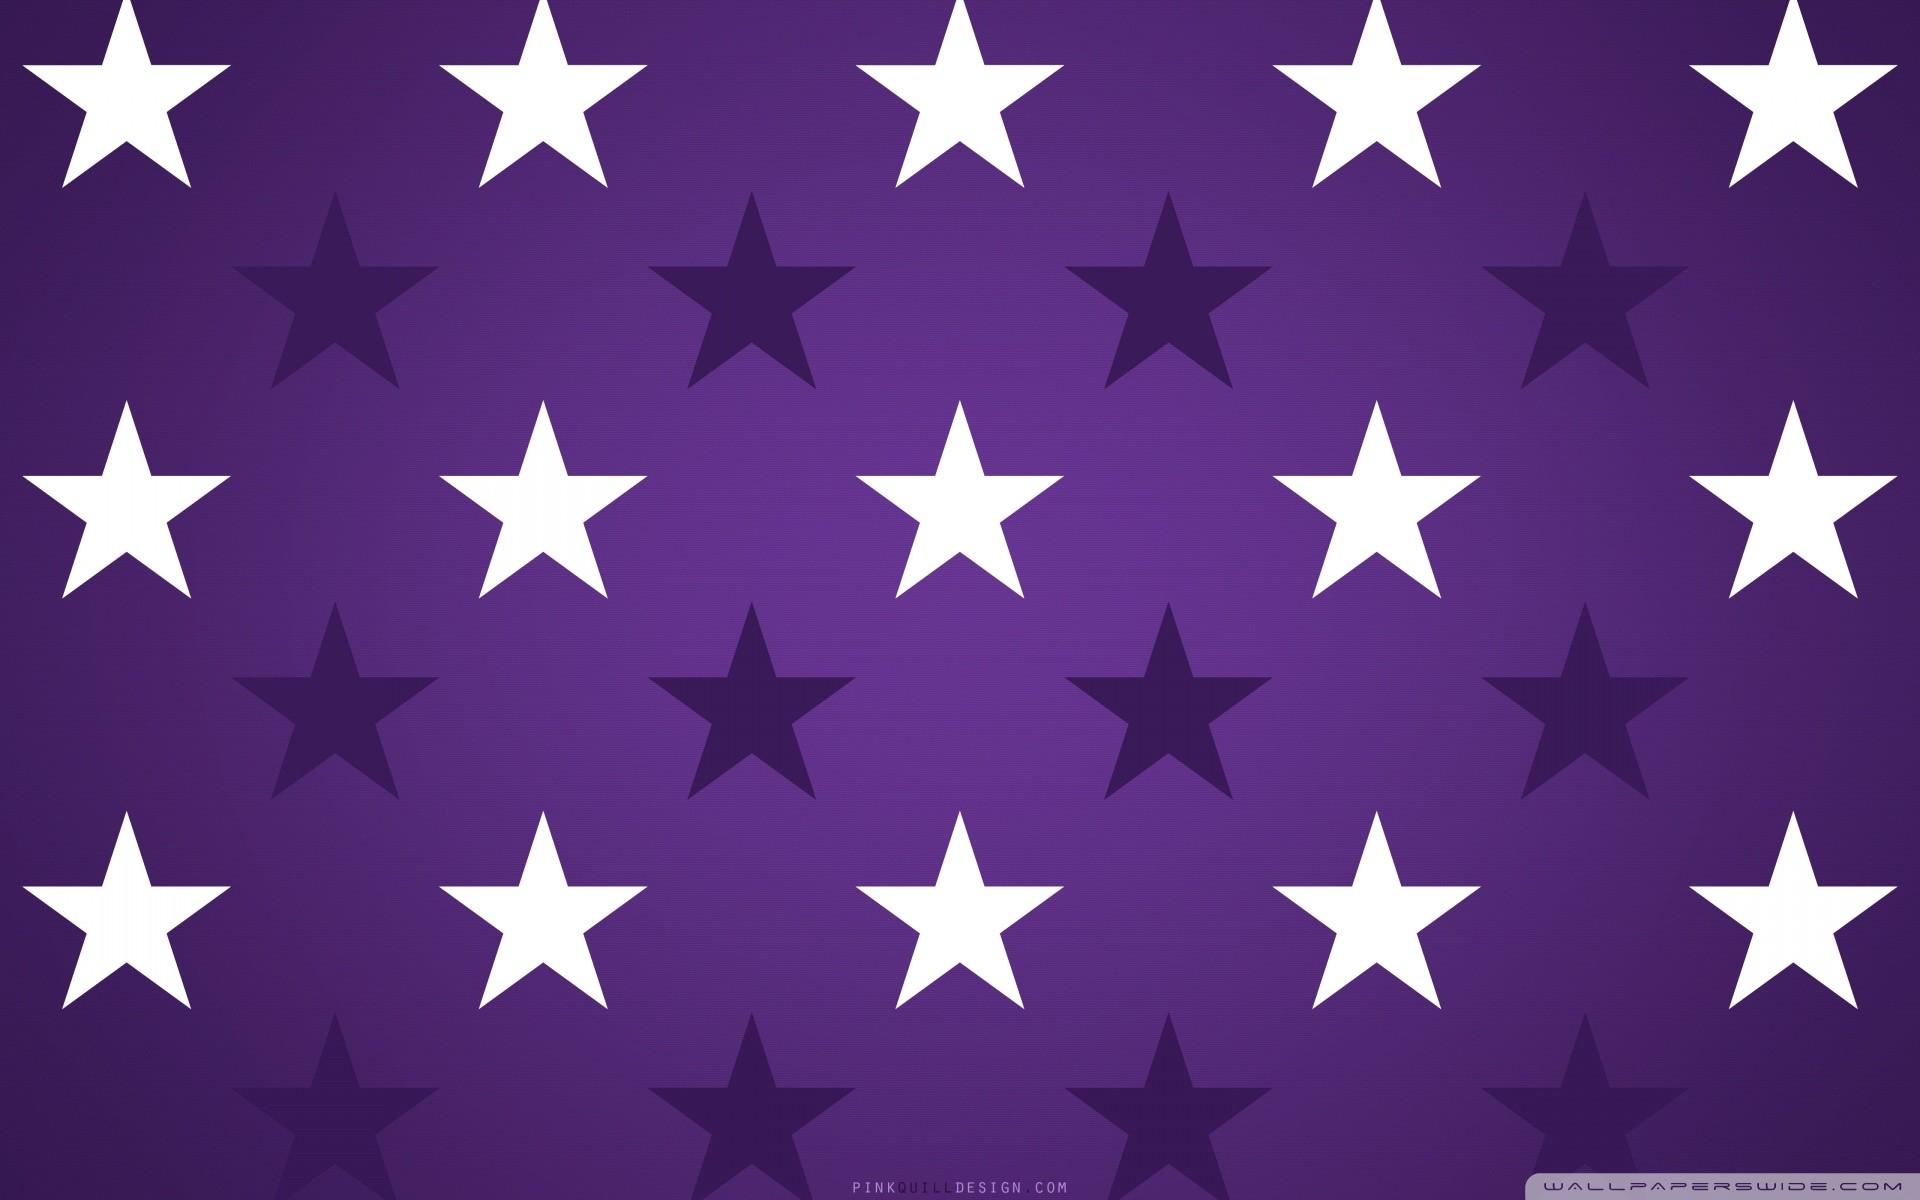 Purple star wallpaper 61 images 1920x1200 wallpaper altavistaventures Images